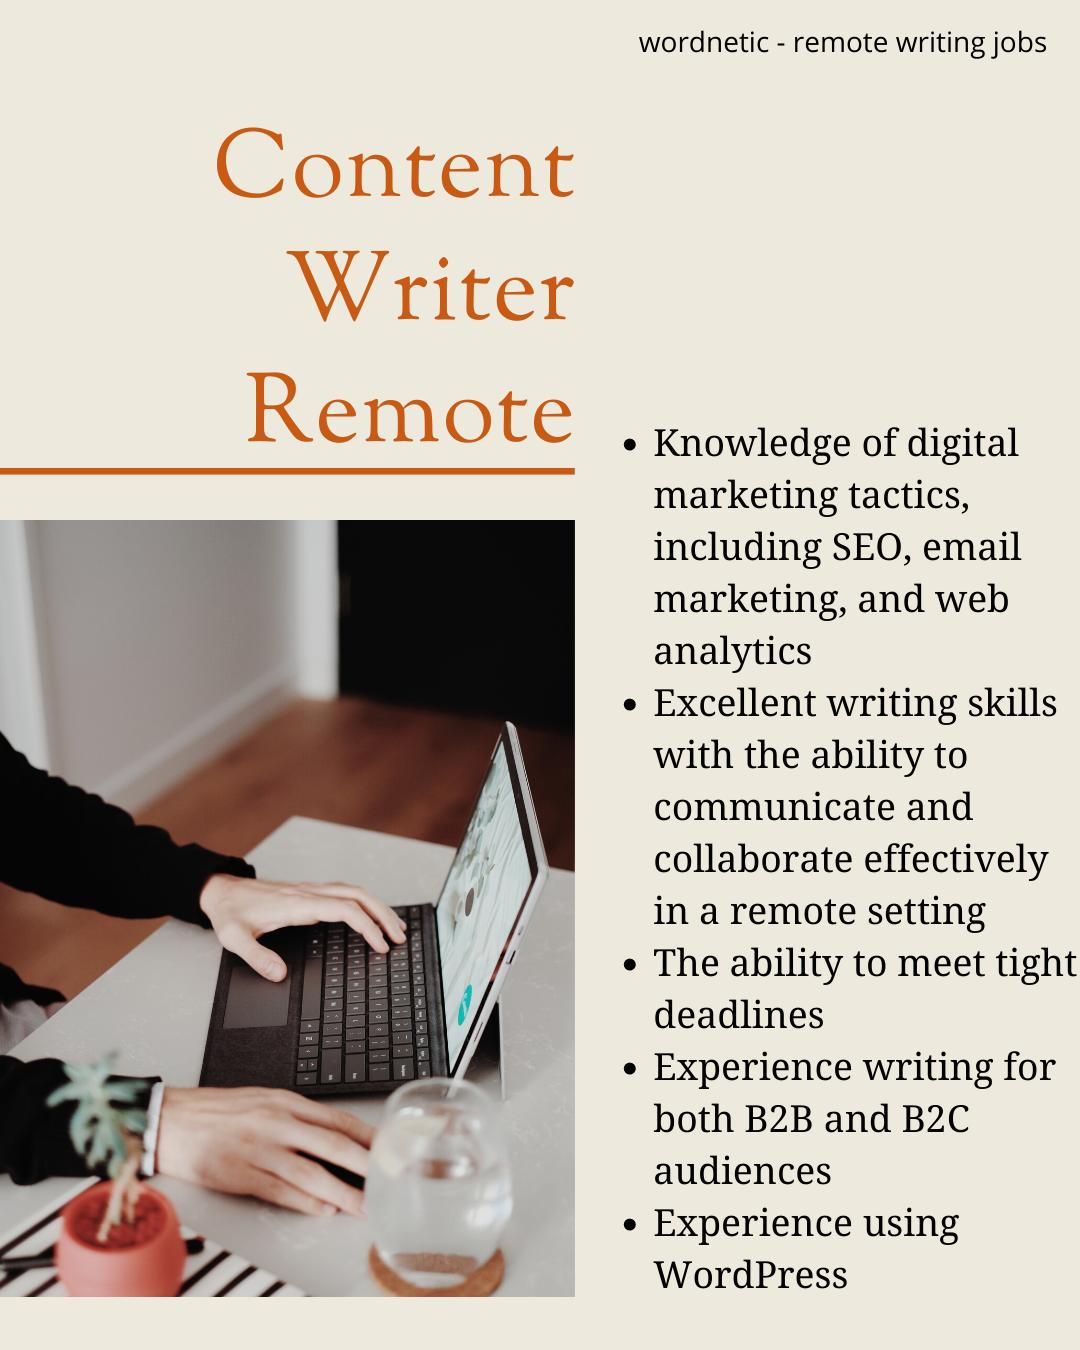 Content Writer Remote Jobs Wordnetic Writing Jobs Writing Skills Writing